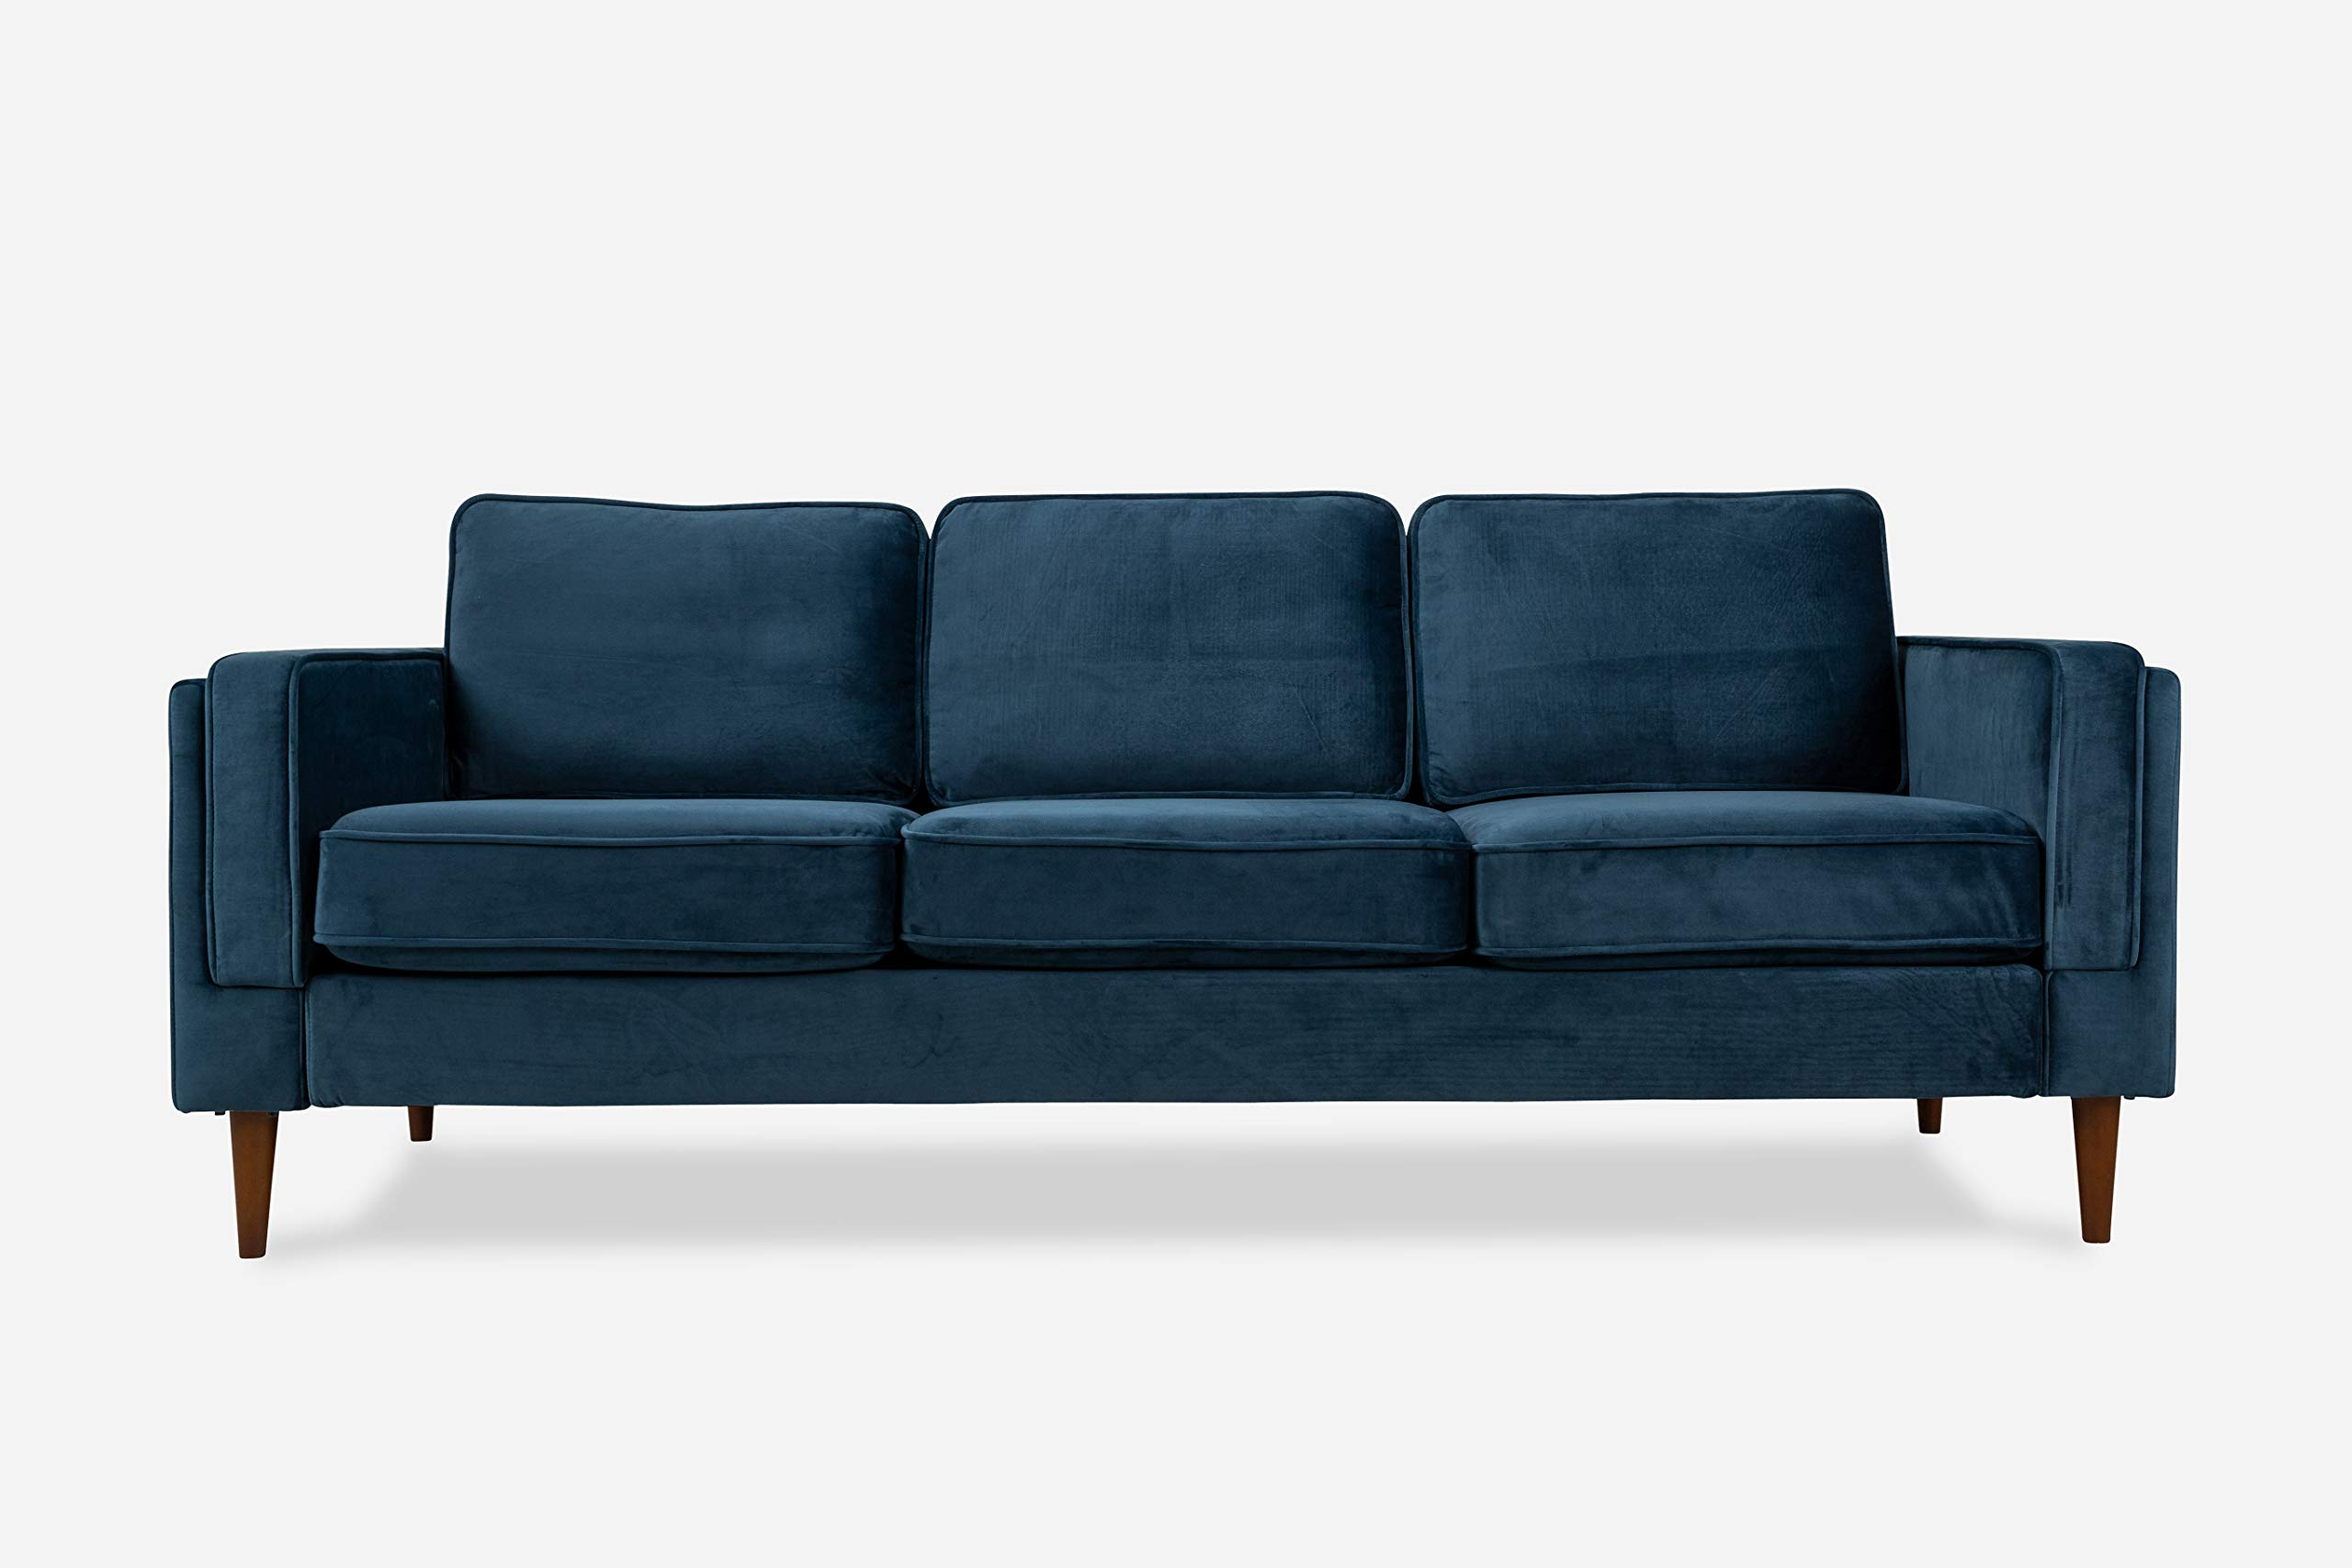 ALBANY PARK Mid-Century Modern Sofa, Blue Velvet by ALBANY PARK